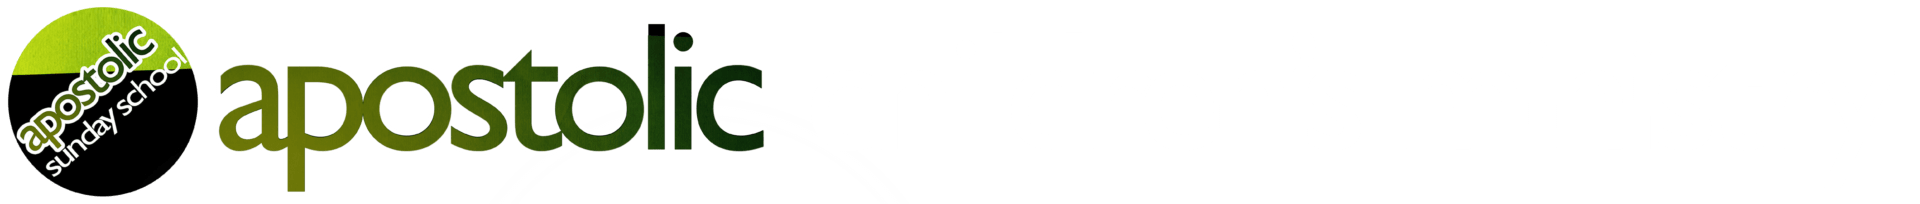 Apostolic Childrens Ministry